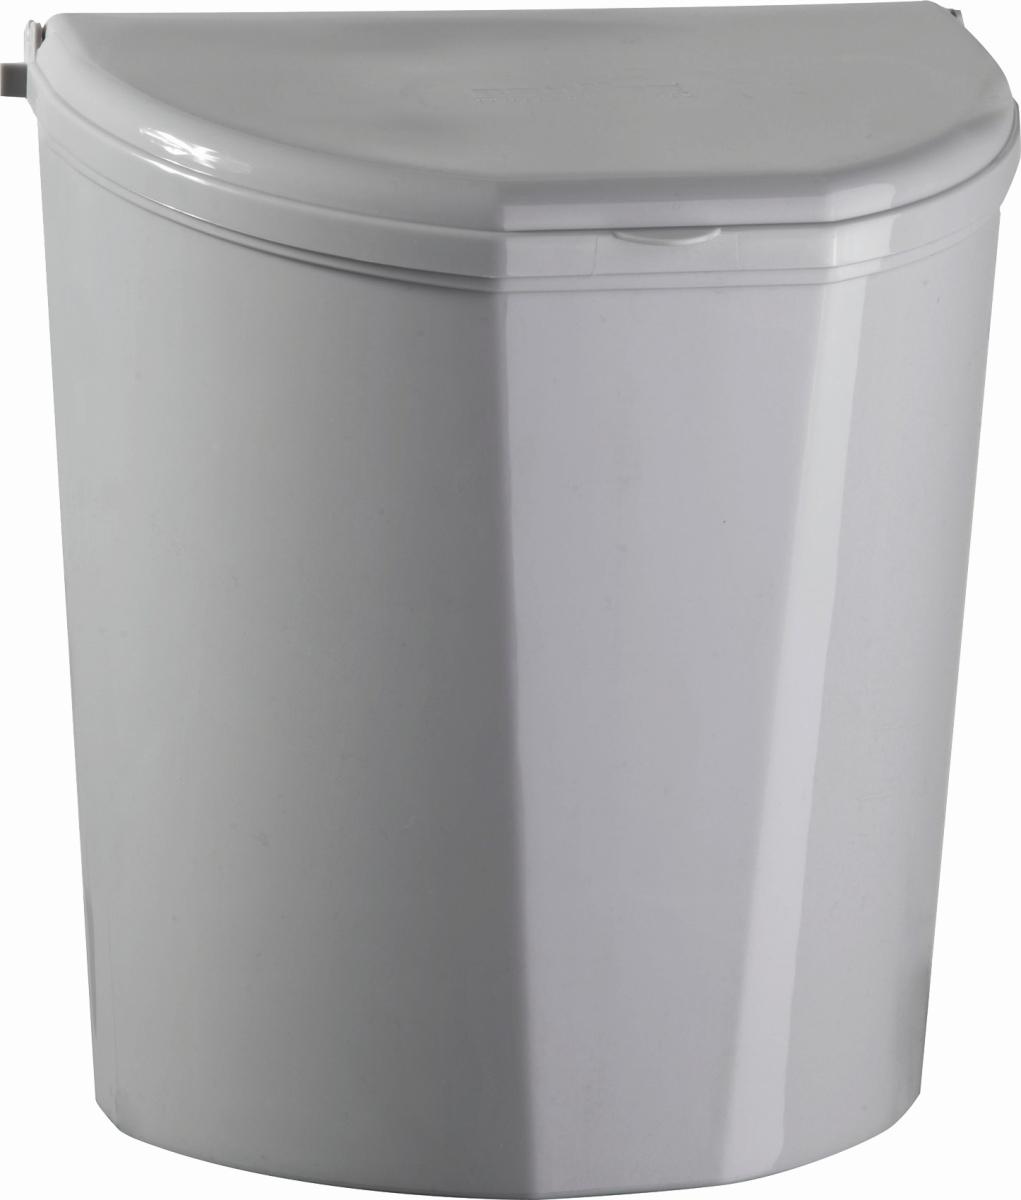 Brunner Abfallbehälter PILLAR XL grau